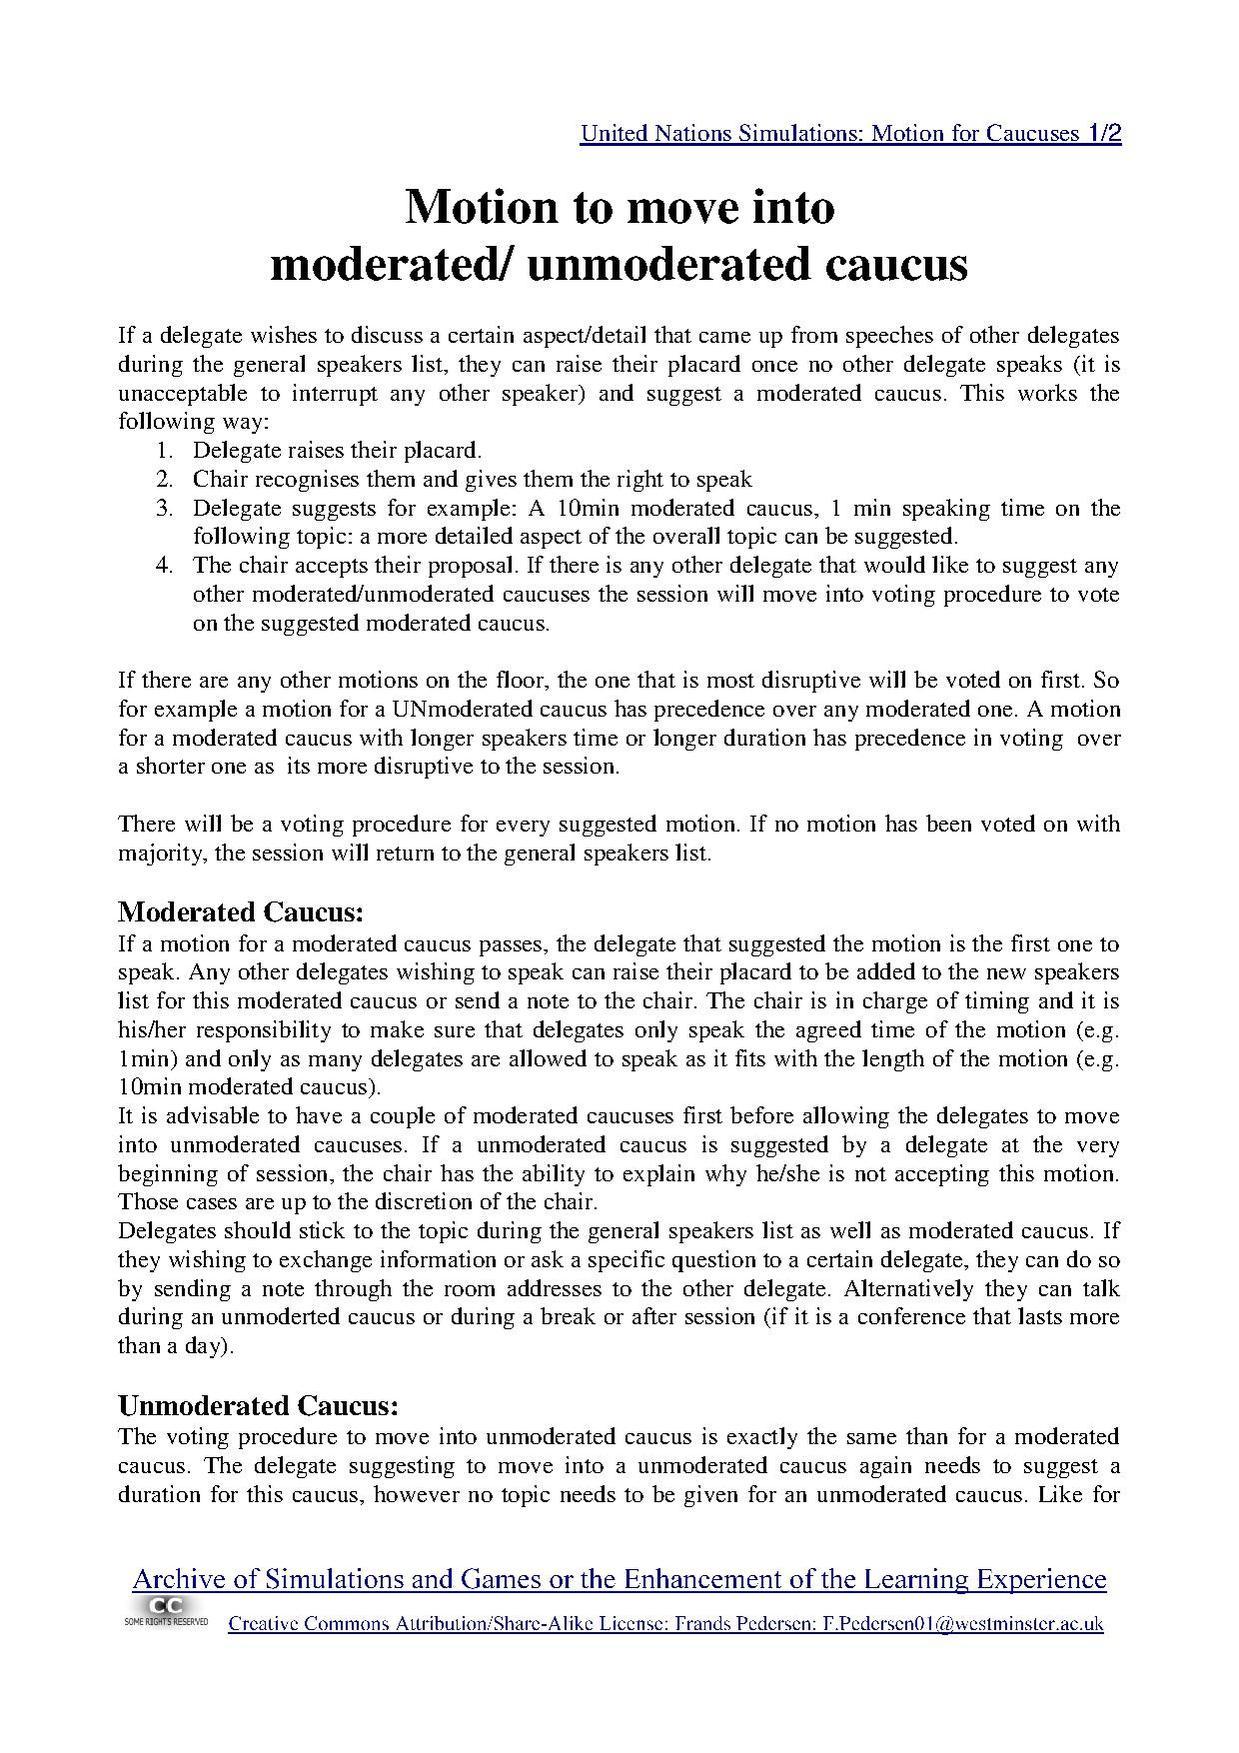 United Nations Simulation  Wikiversity